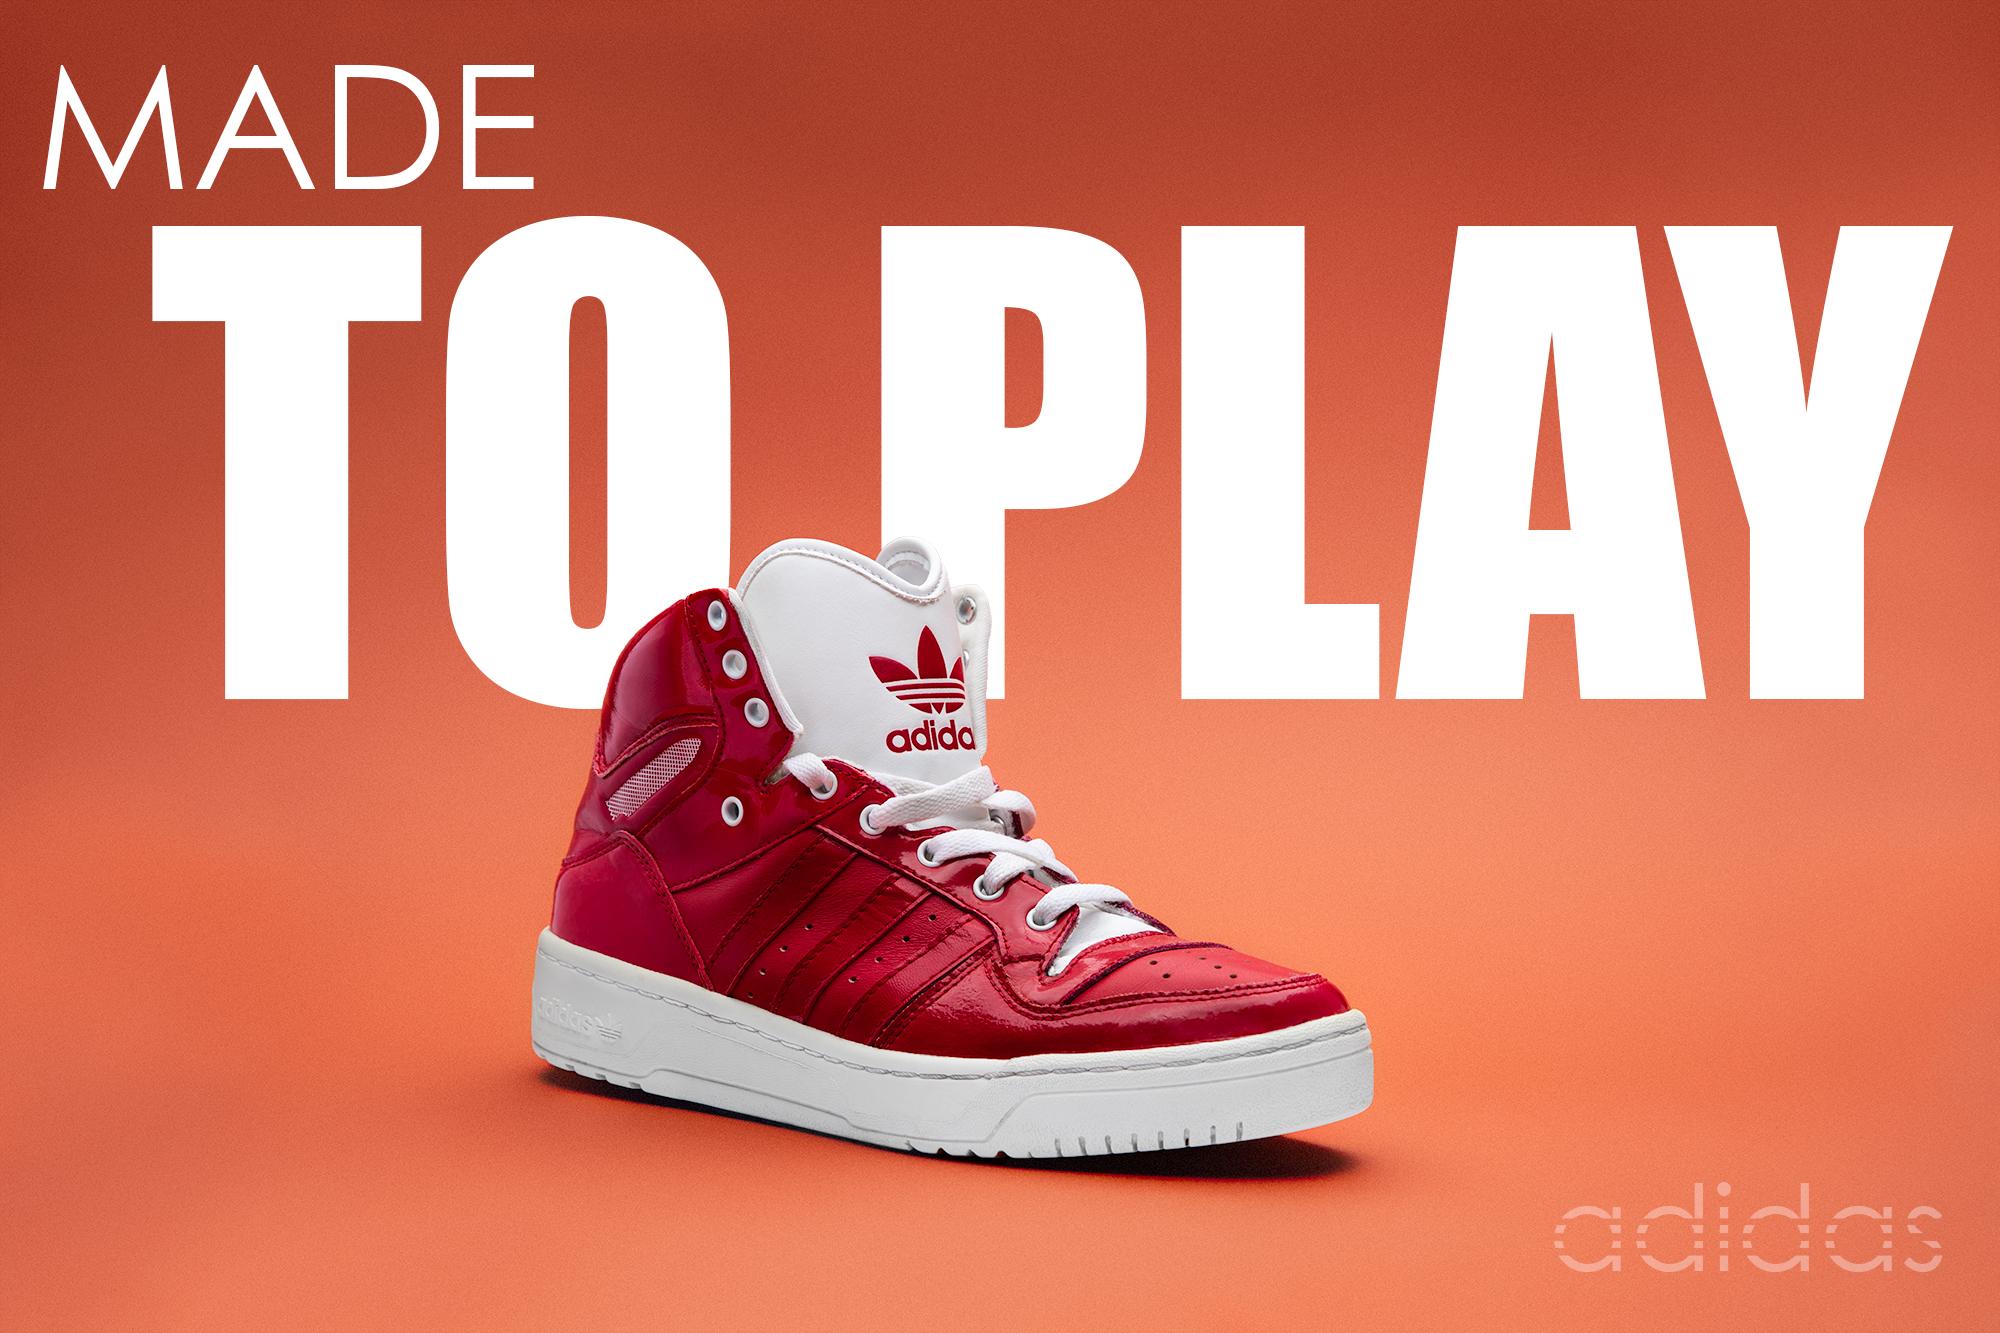 Shoe shoot-0120-Edit.jpg